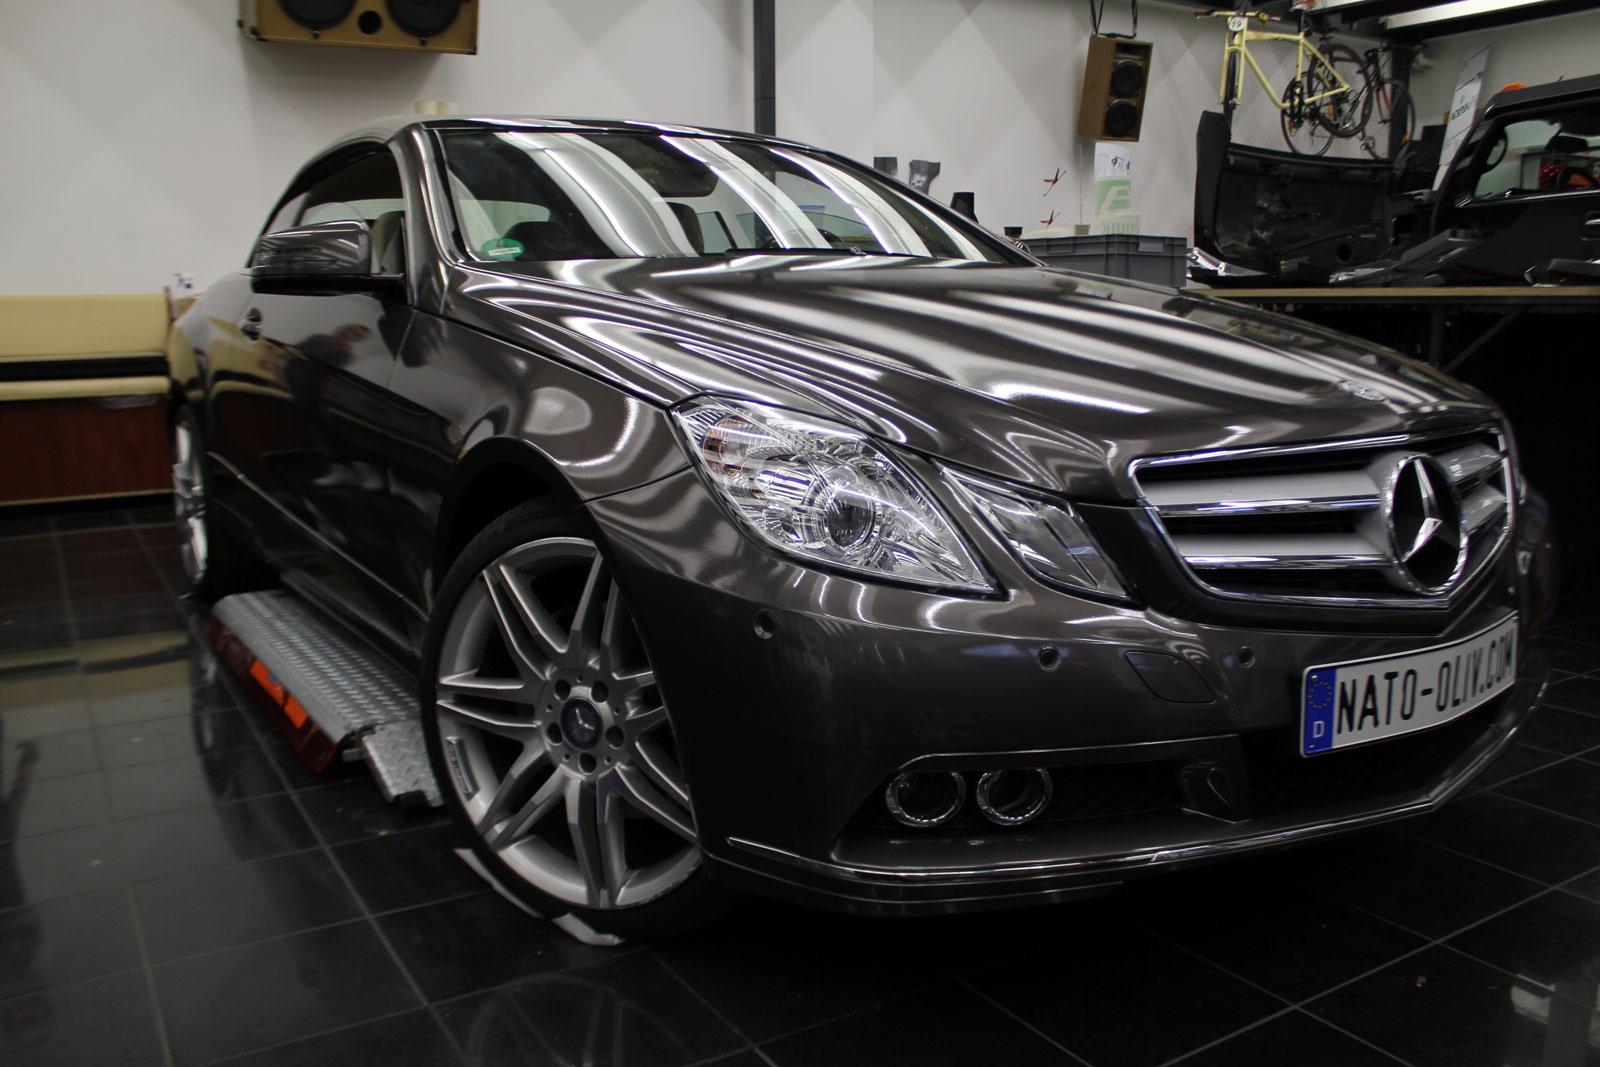 Mercedes_E-Klasse_Cabrio_Folierung_Stannitgrau_Metallic_Glanz_26